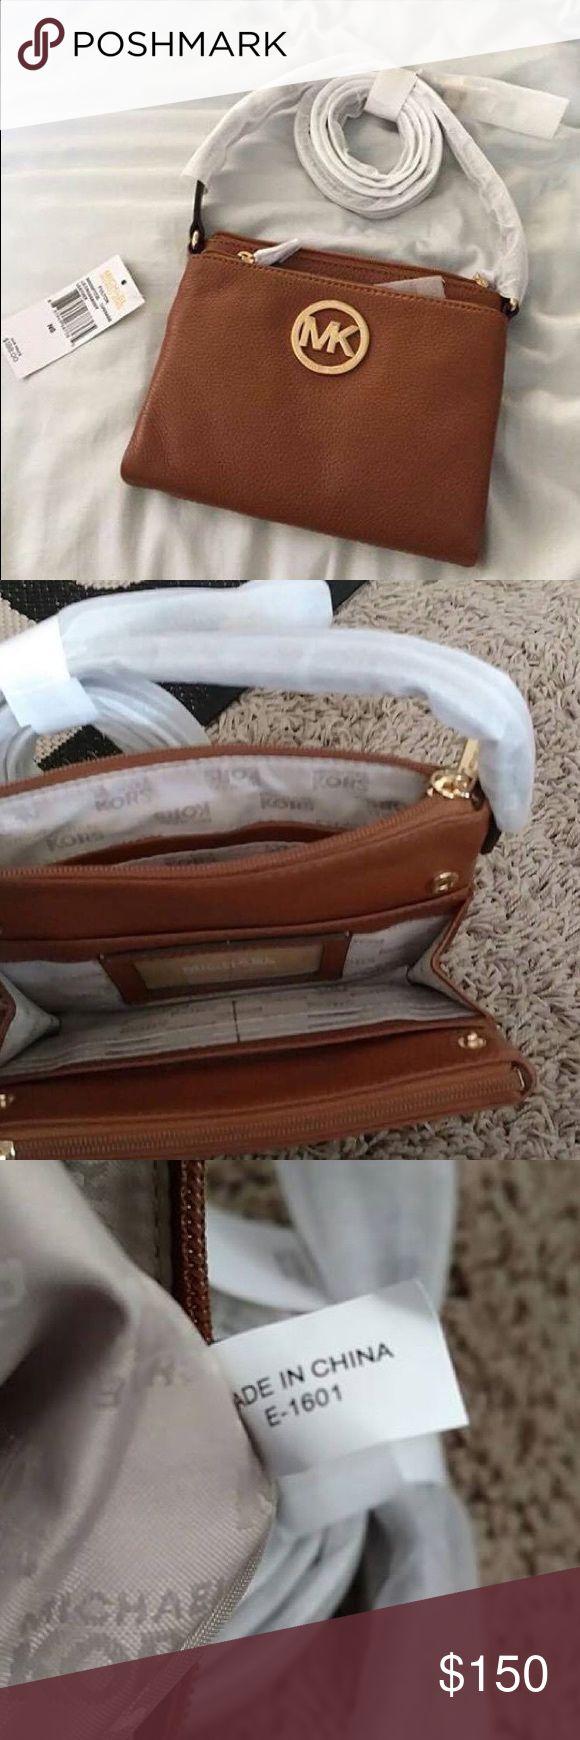 MICHEAL KORS FULTON CROSSBODY Brand new with tags originally paid 190 Michael Kors Bags Crossbody Bags